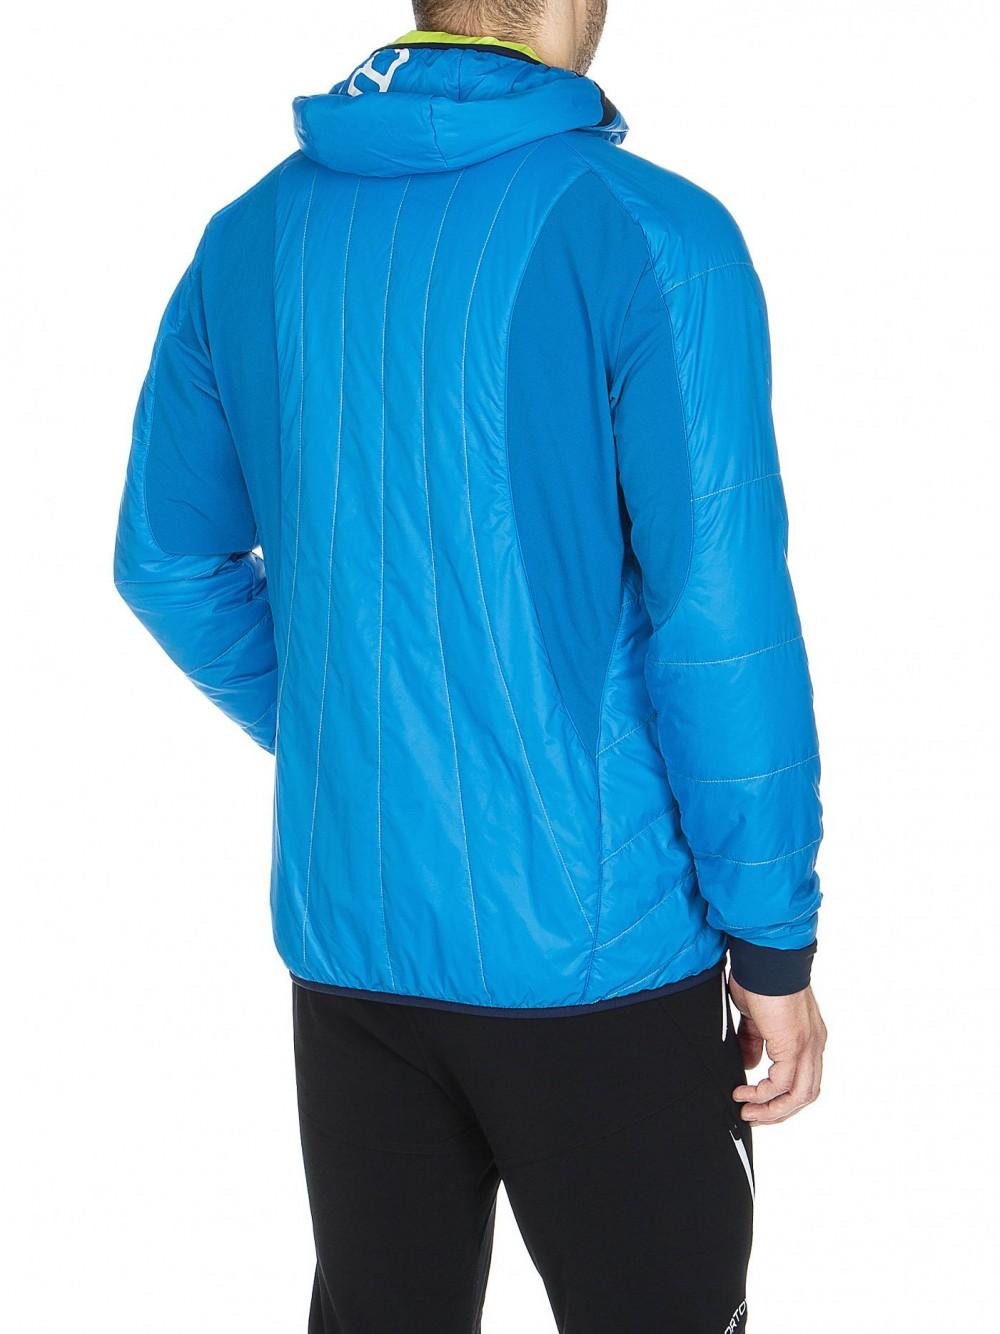 Куртка ORTOVOX swisswool piz boè jacket (размер M) - 2